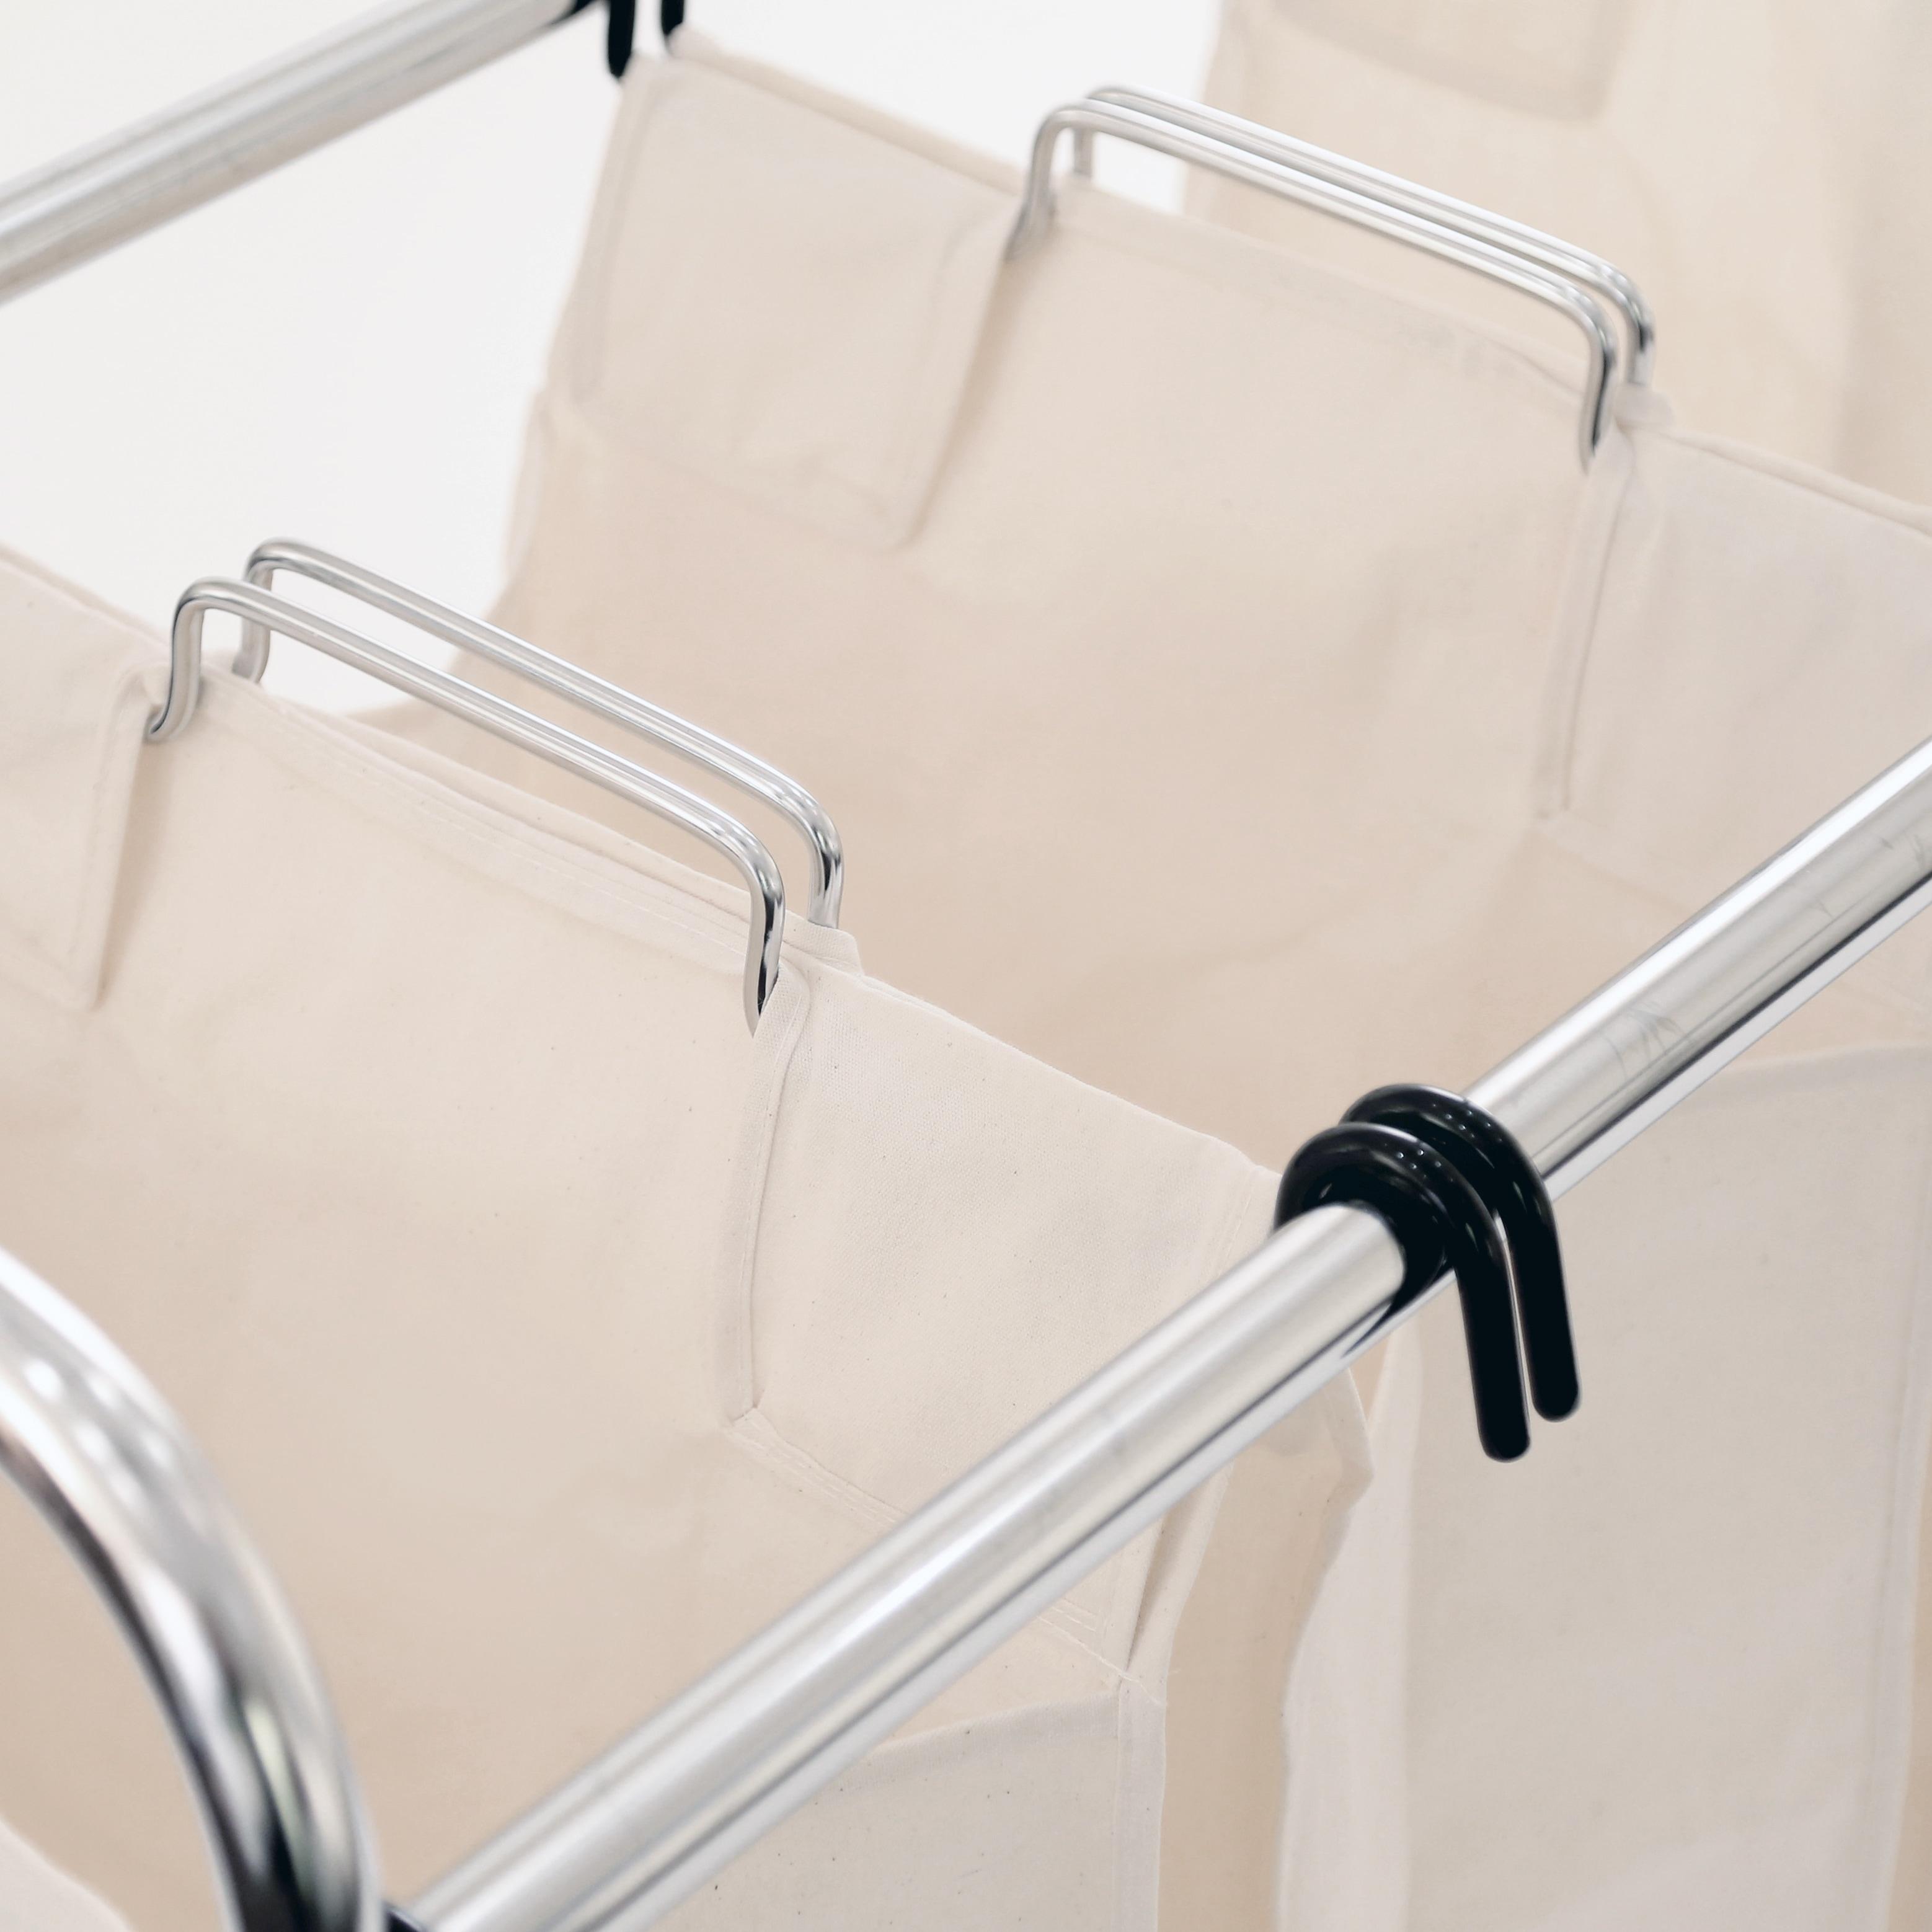 Shop 3 Bag Heavy Duty Laundry Hamper Sorter Cart With Clothes Rack